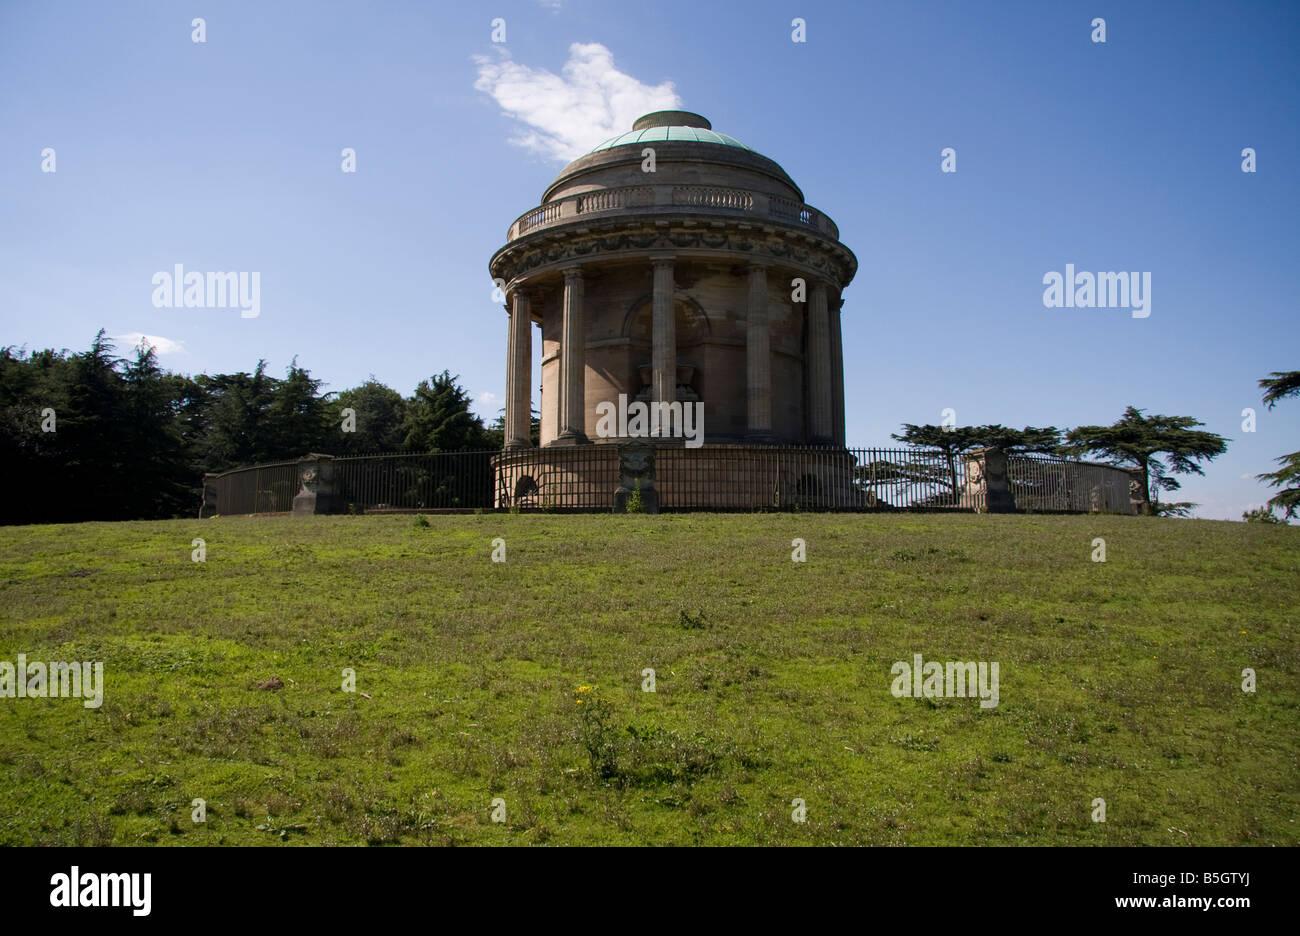 Mausoleum - Stock Image